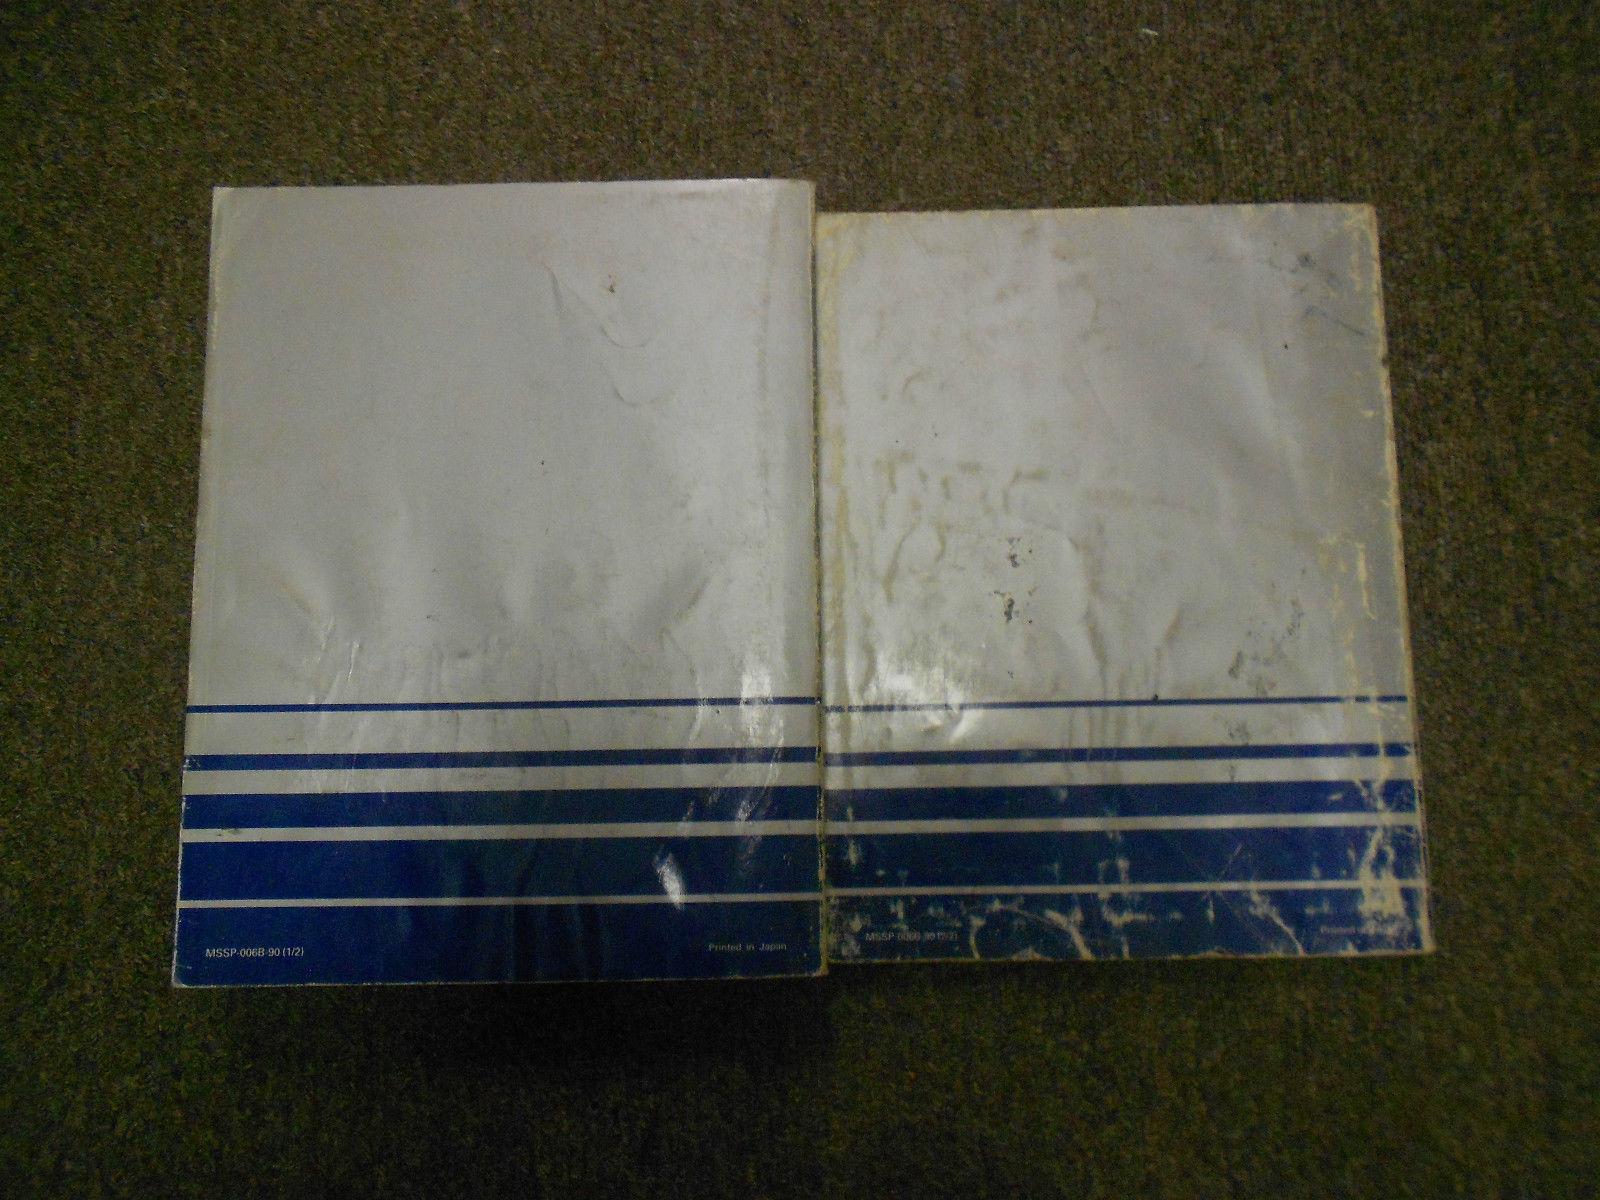 1990 MITSUBISHI Mirage Service Repair Shop Manual FACTORY OEM BOOK 90 2 VOL SET